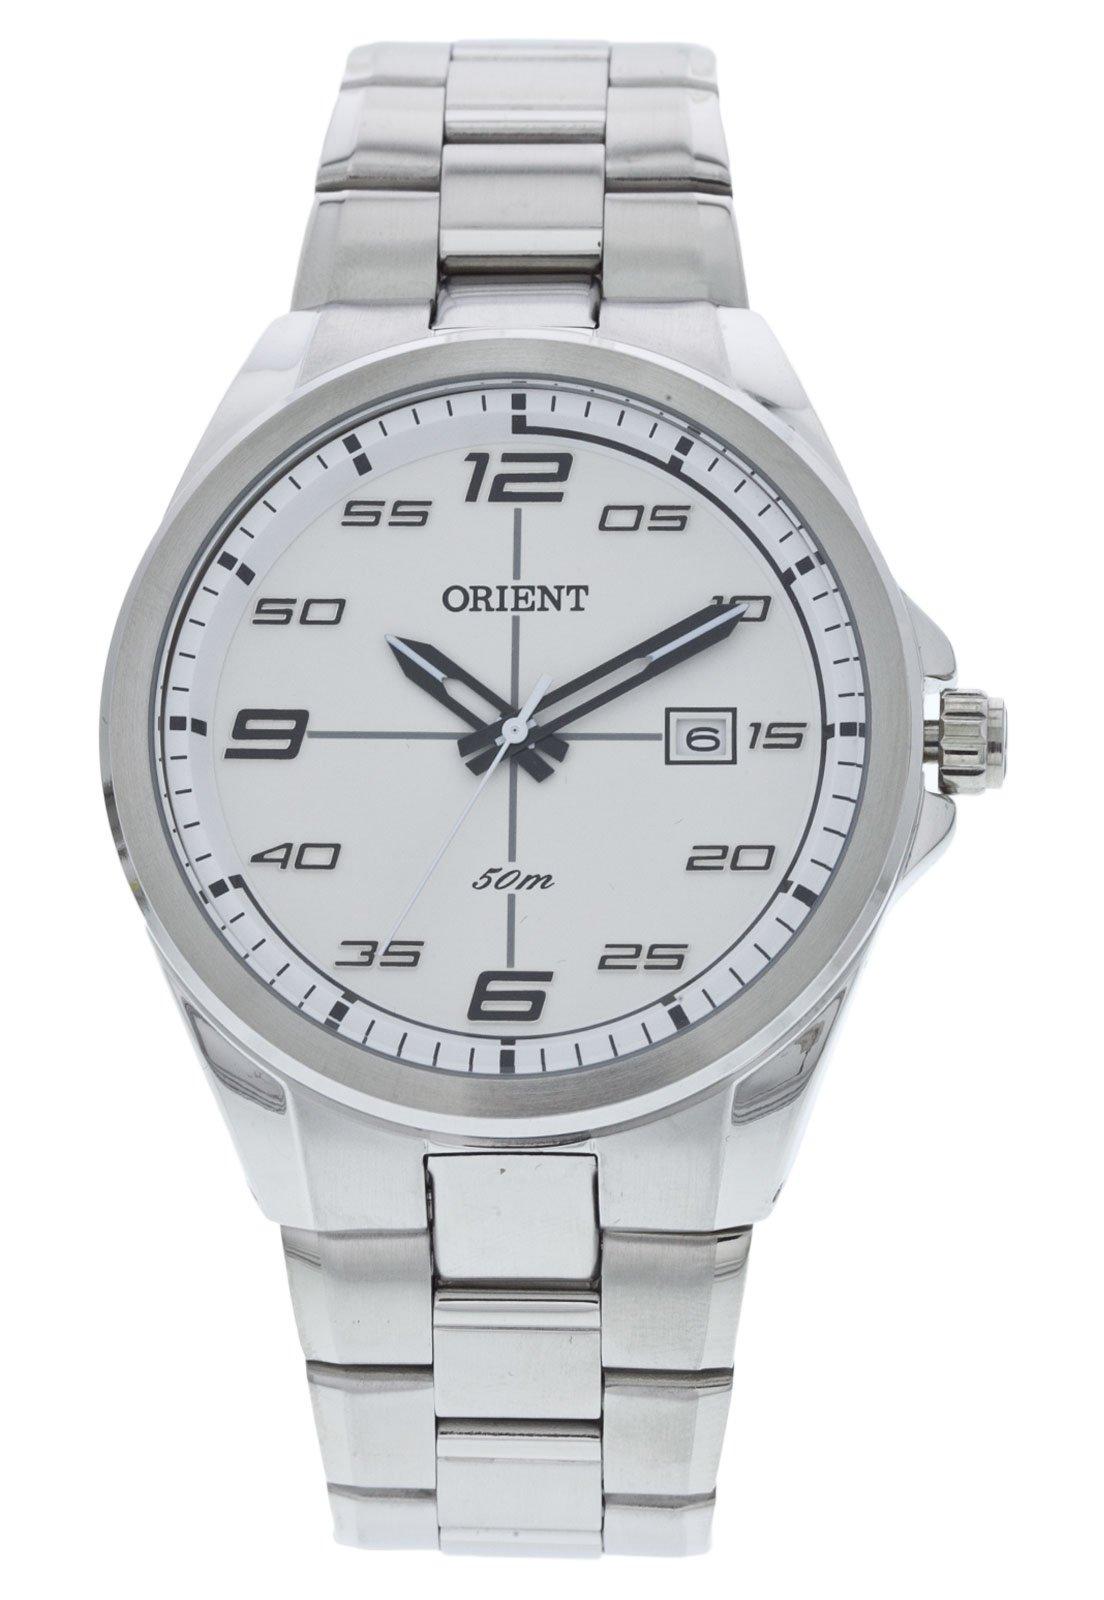 Orient MBSS1220 BPSX LTC1709